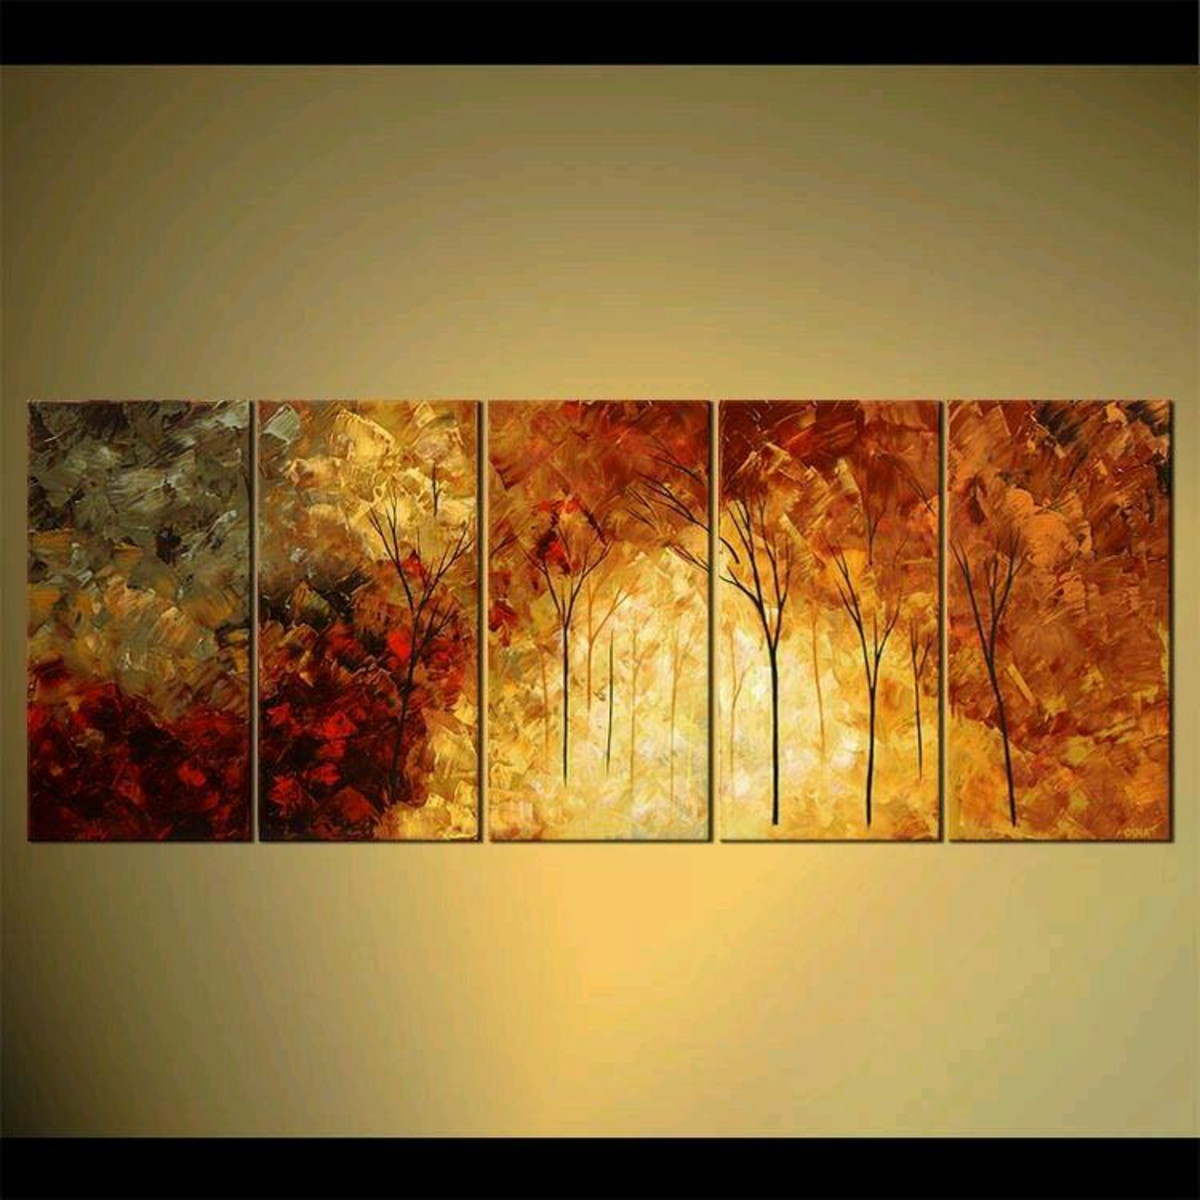 Quadro Abstrato Quadro Decorativo Keep Calm And Create Modelo  -> Quadro Abstrato Pra Sala Barato